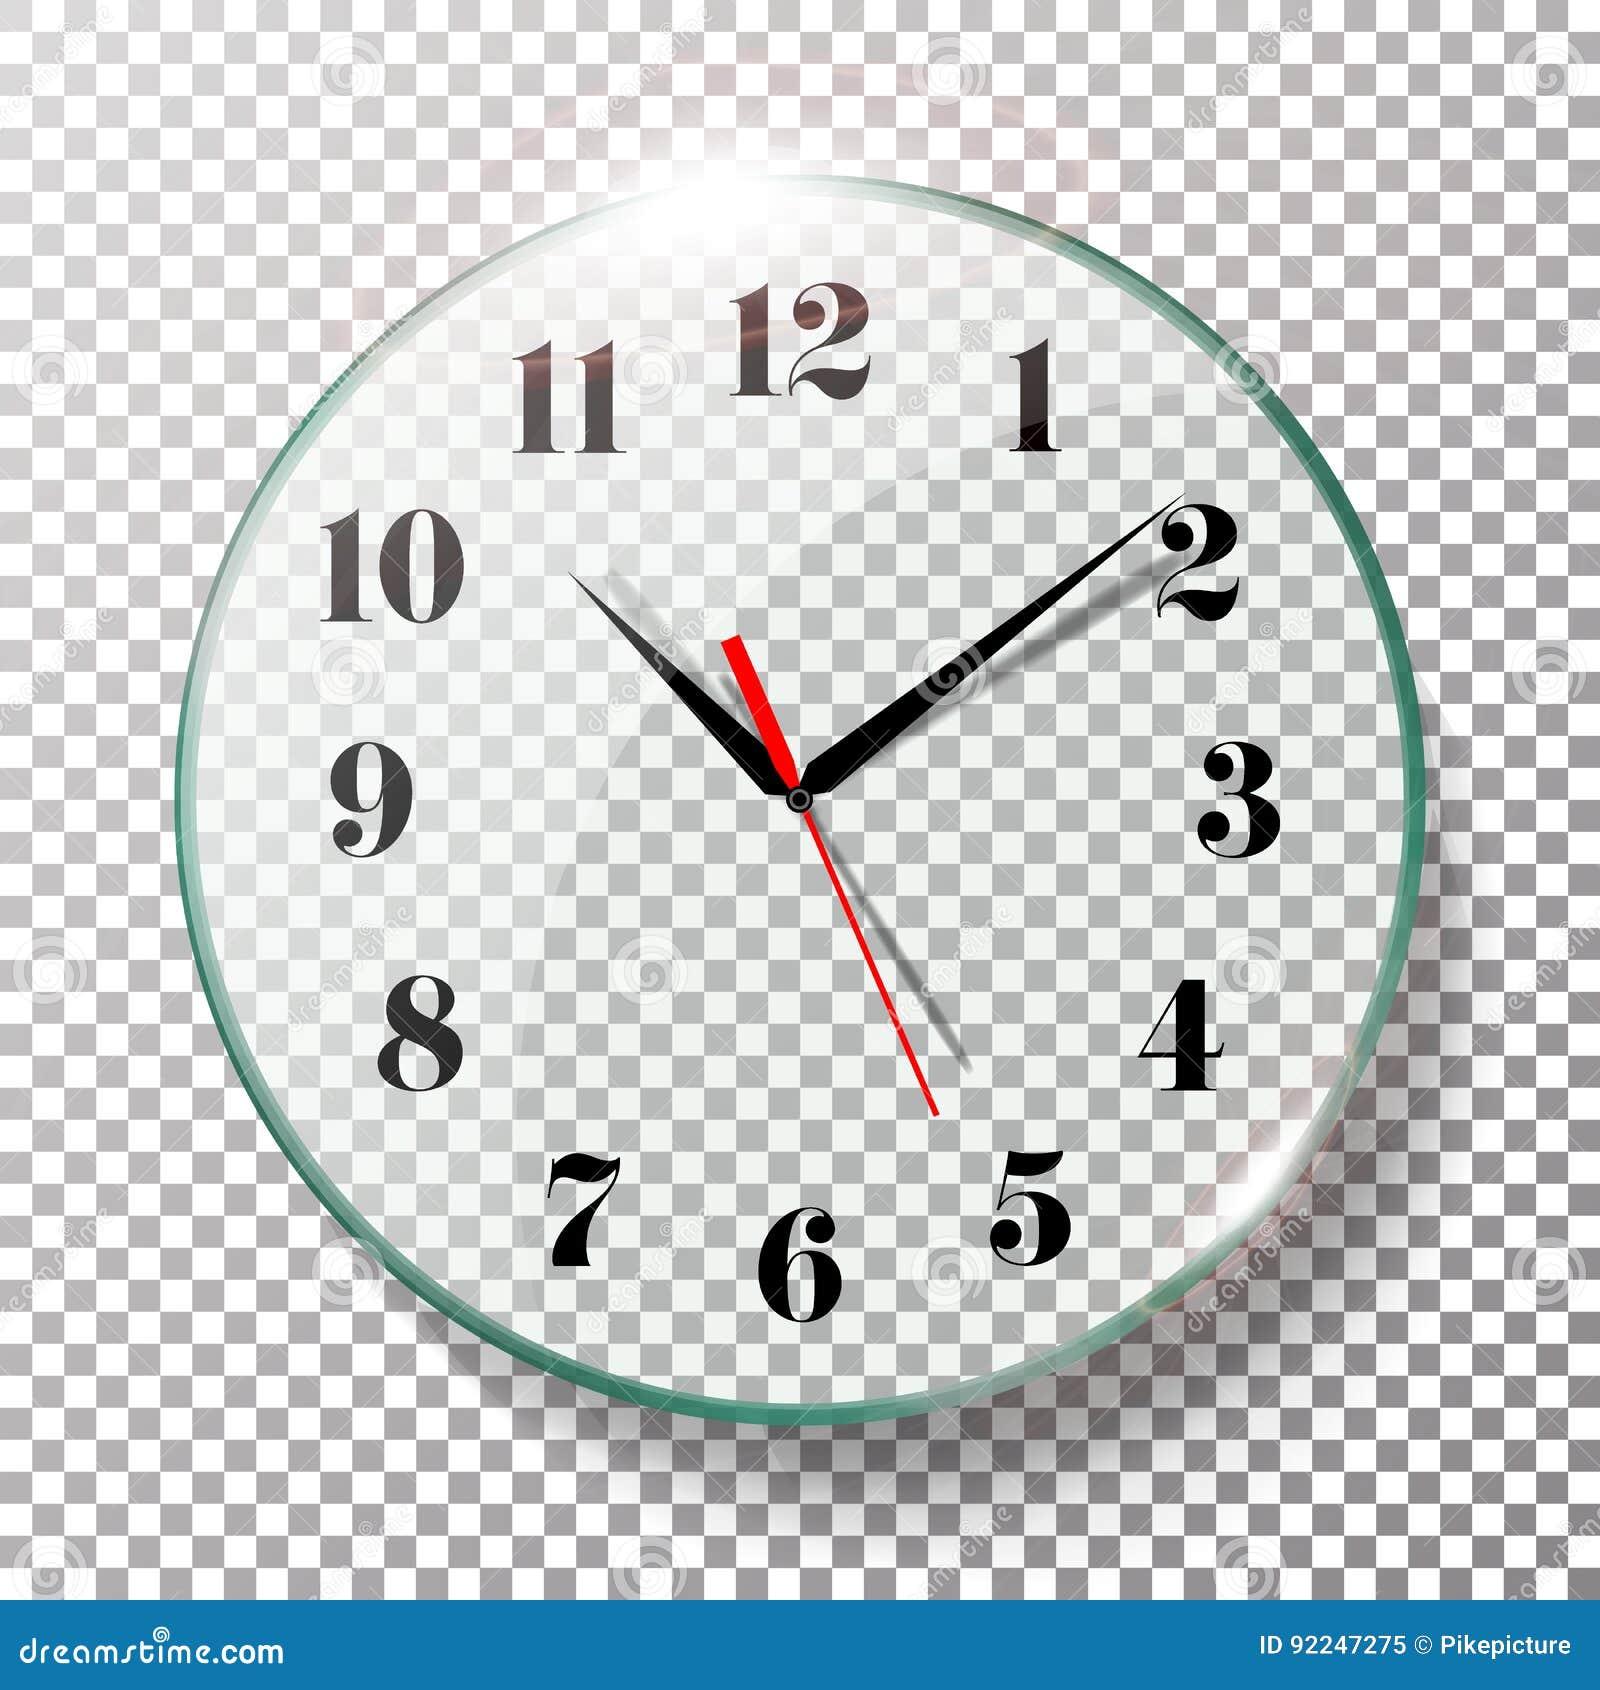 Realistic Wall Clocks Set Vector Illustration. Wall Office ...